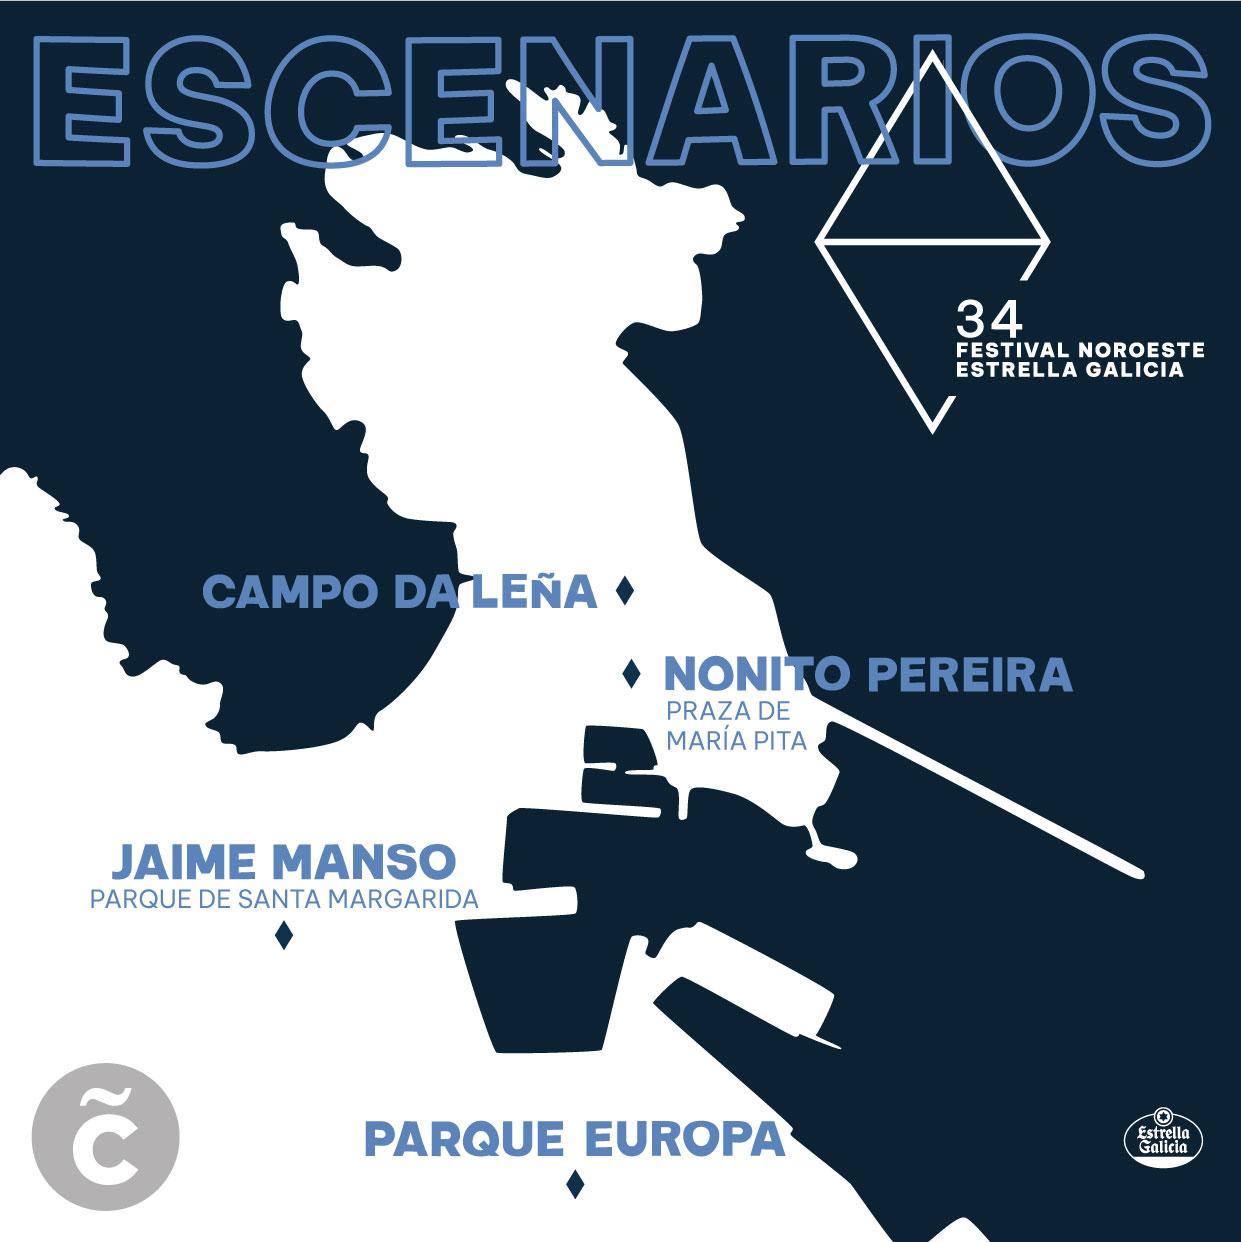 Apertura das reservas para o 34 Festival Noroeste Estrella Galicia